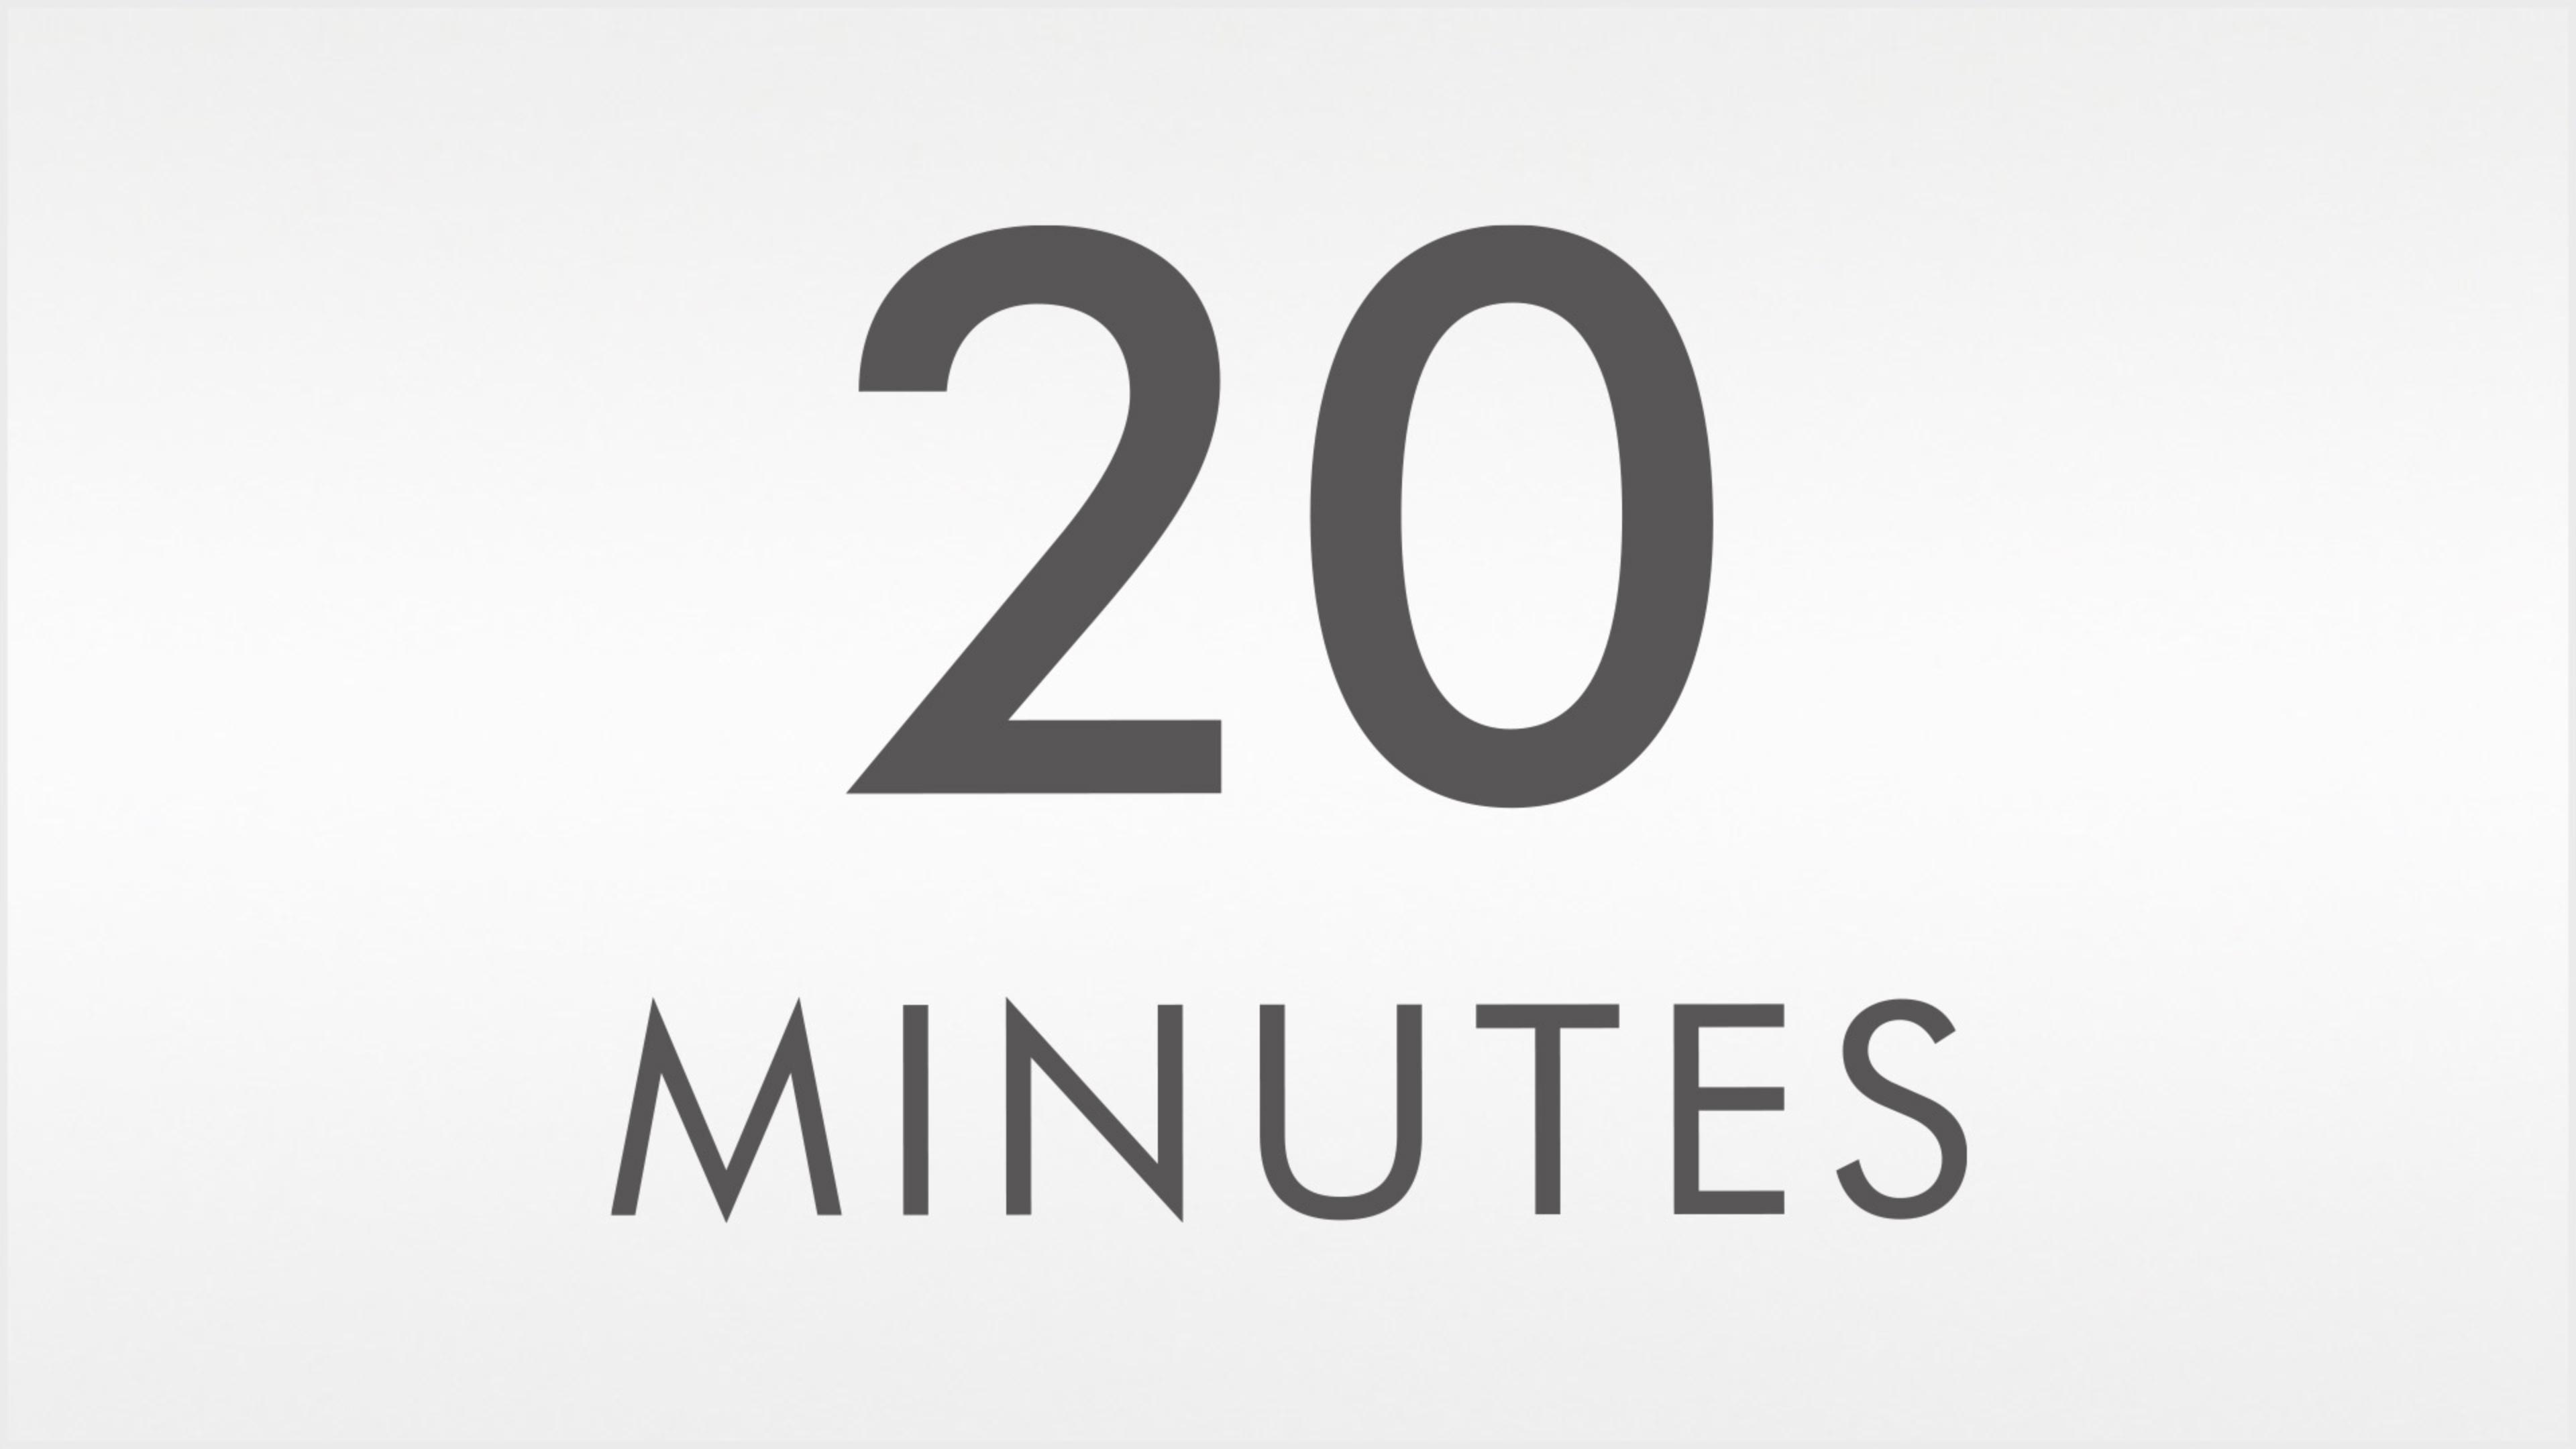 20-minute tun time image